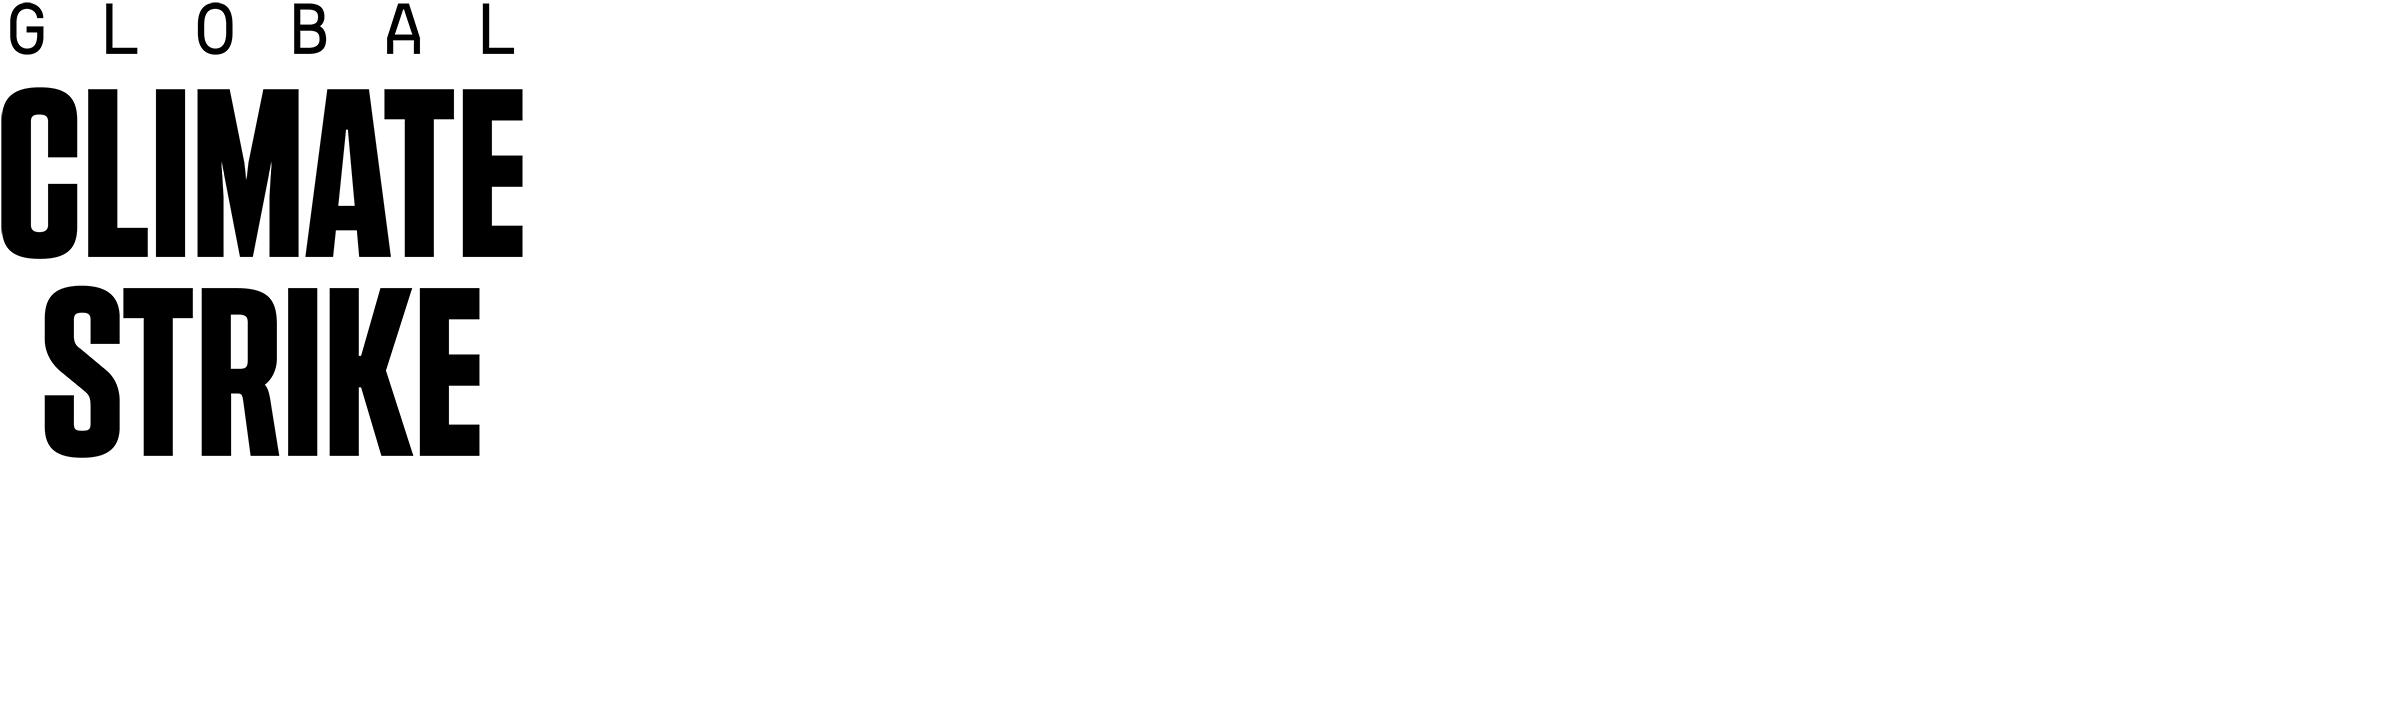 gcs_logo_720_2400_alt.png